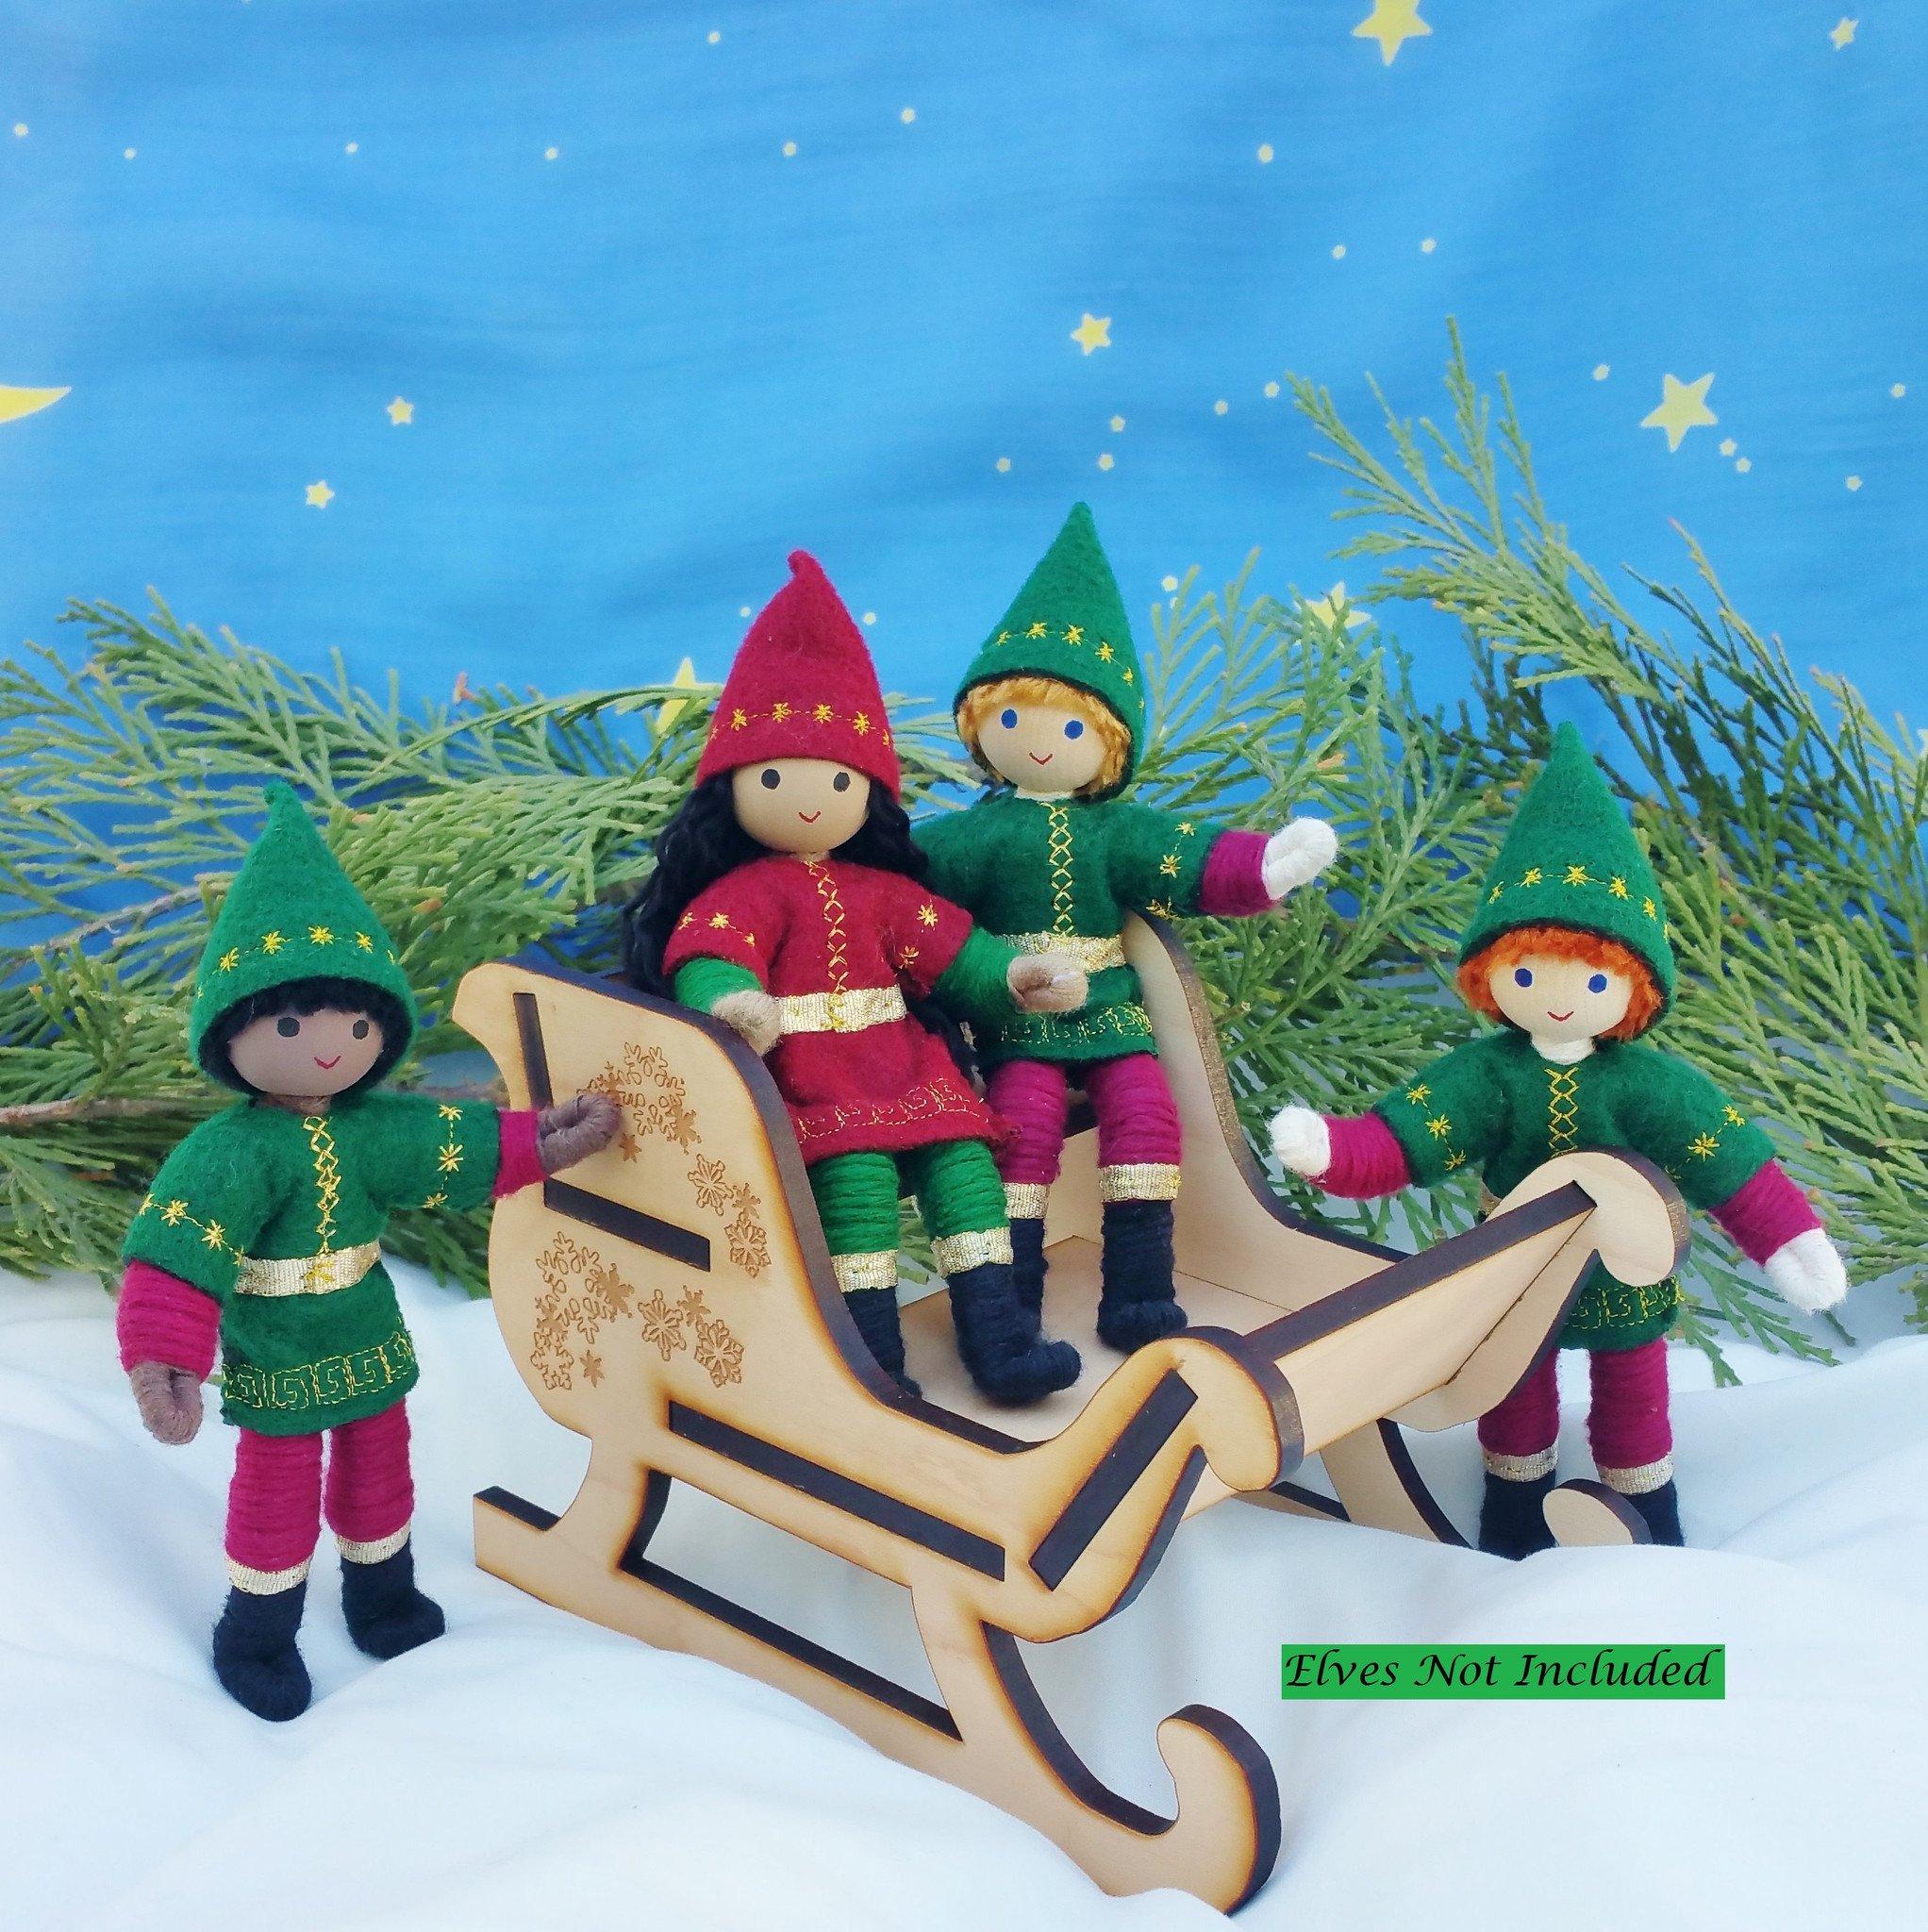 Miniatre Wooden Sleigh   Wildflower Toys ™